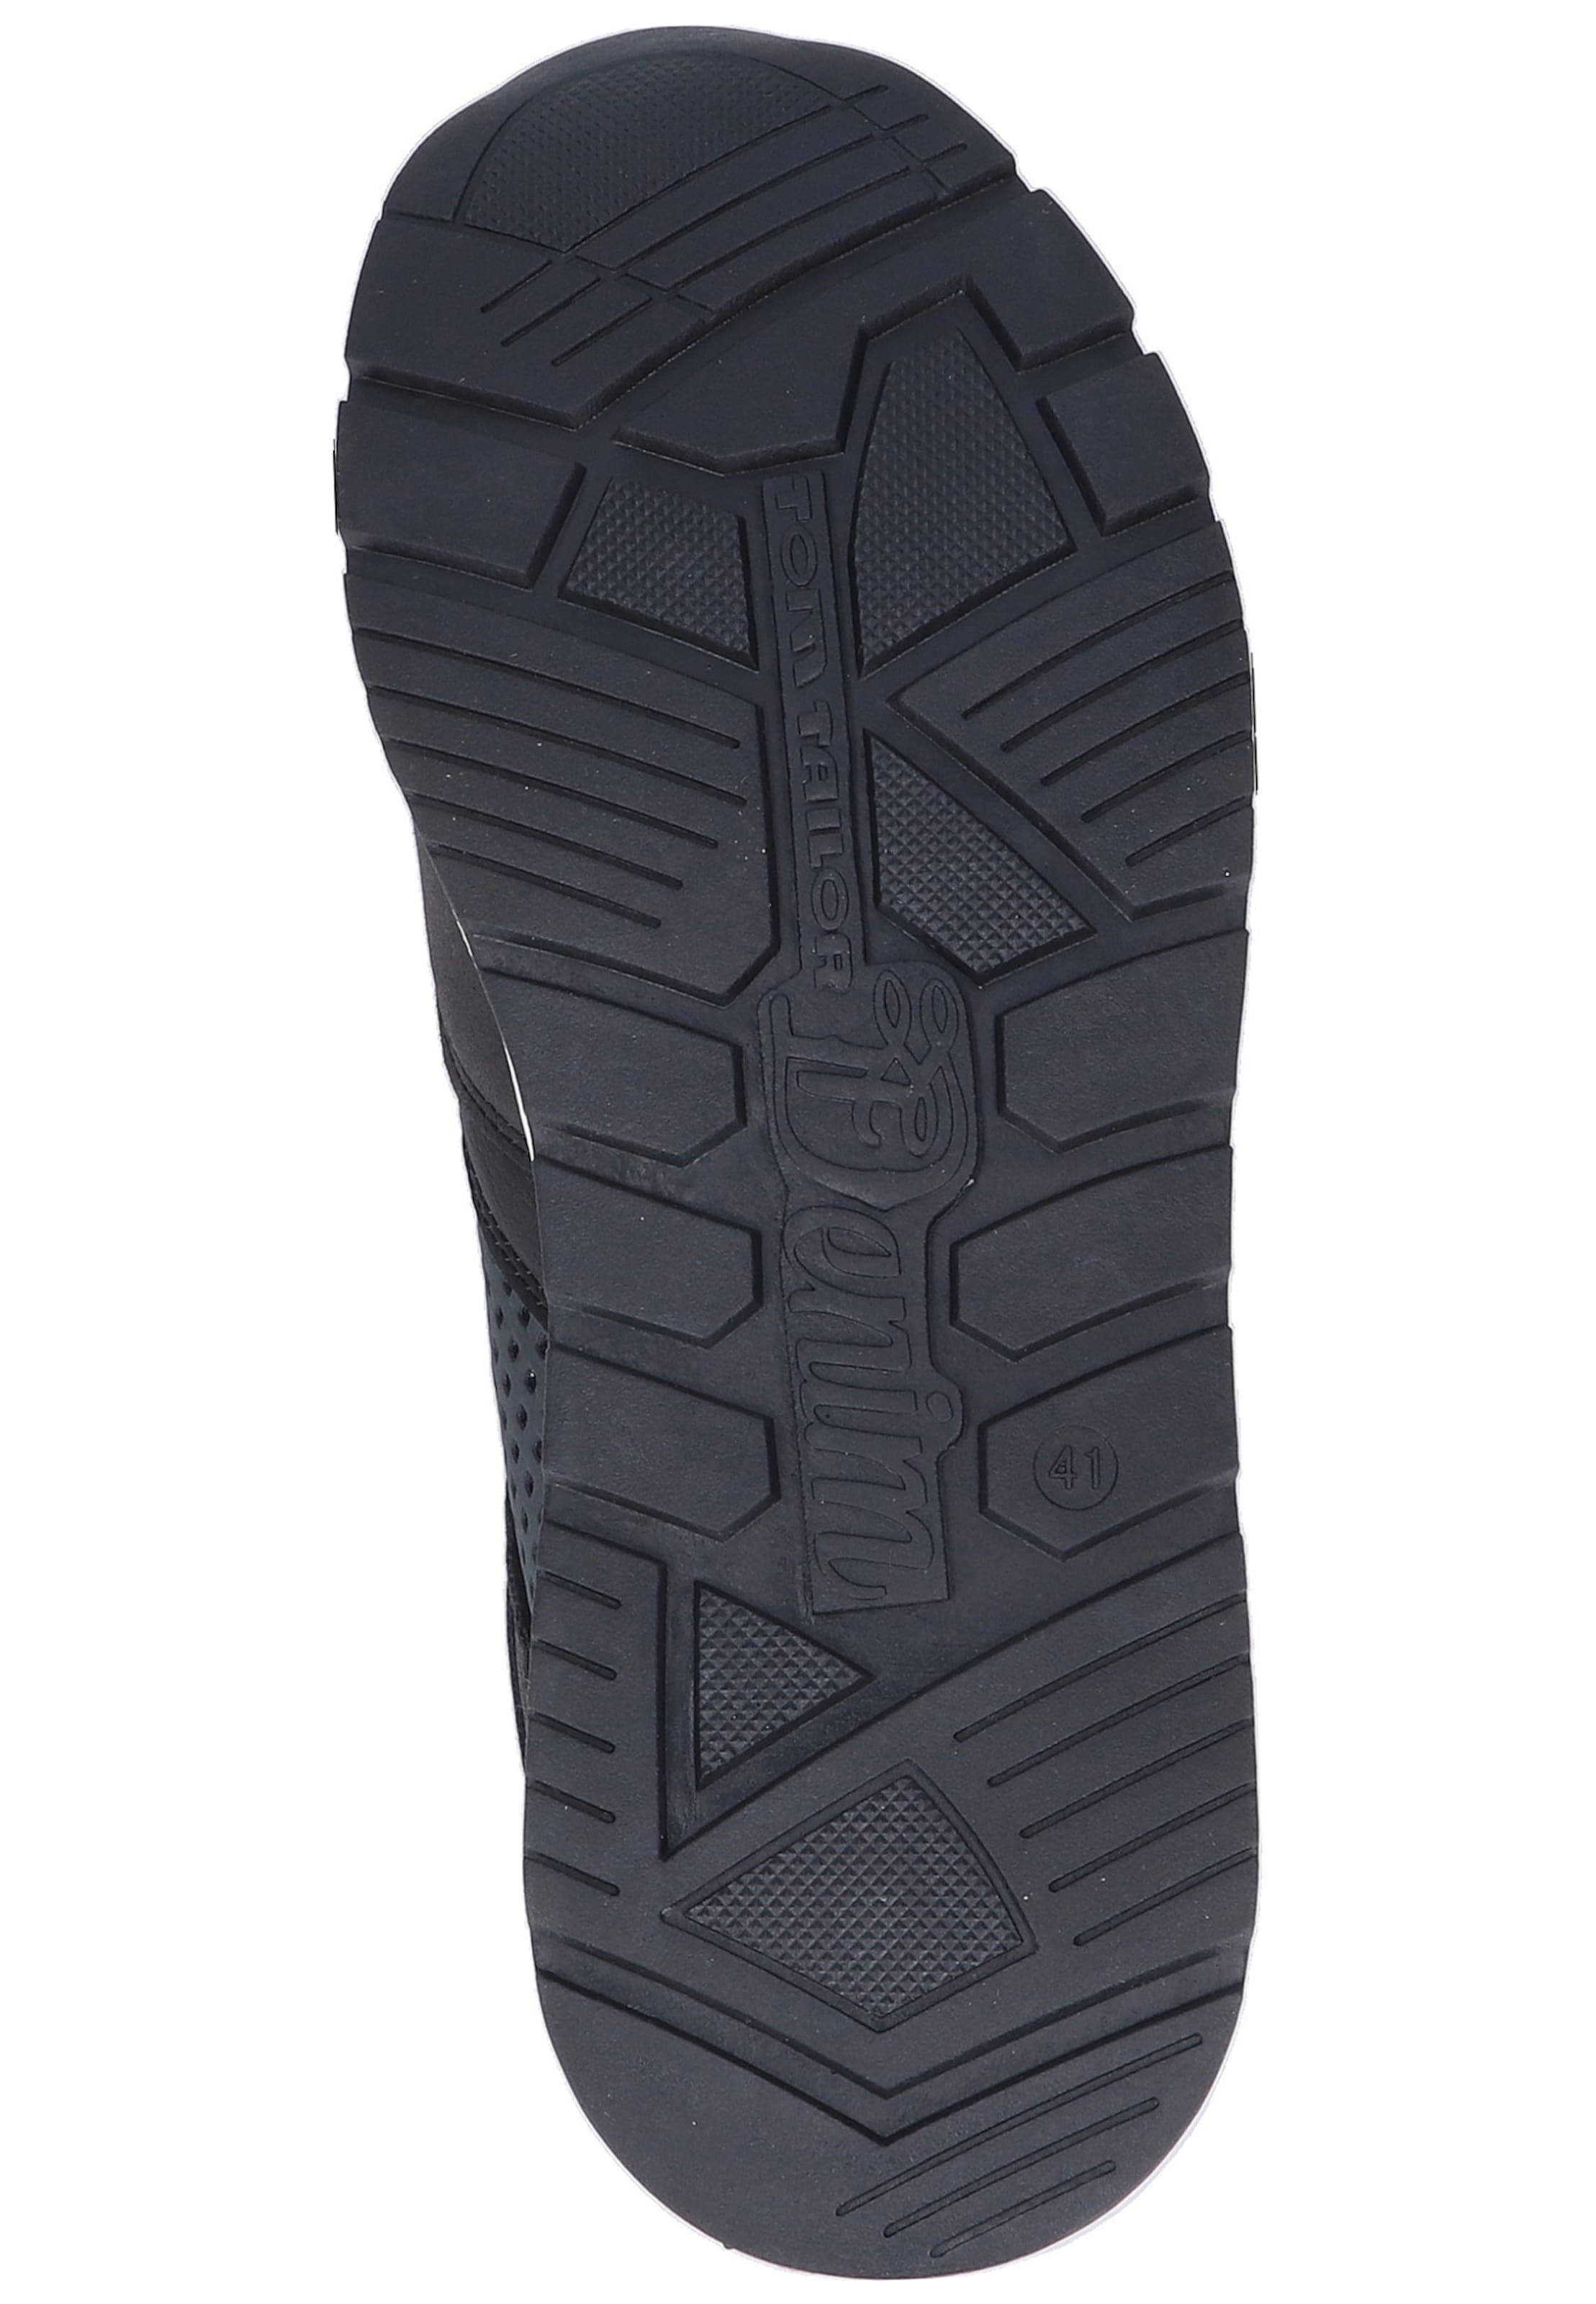 In Schwarz NachtblauBeere Sneaker Tom Tailor wOPk8n0